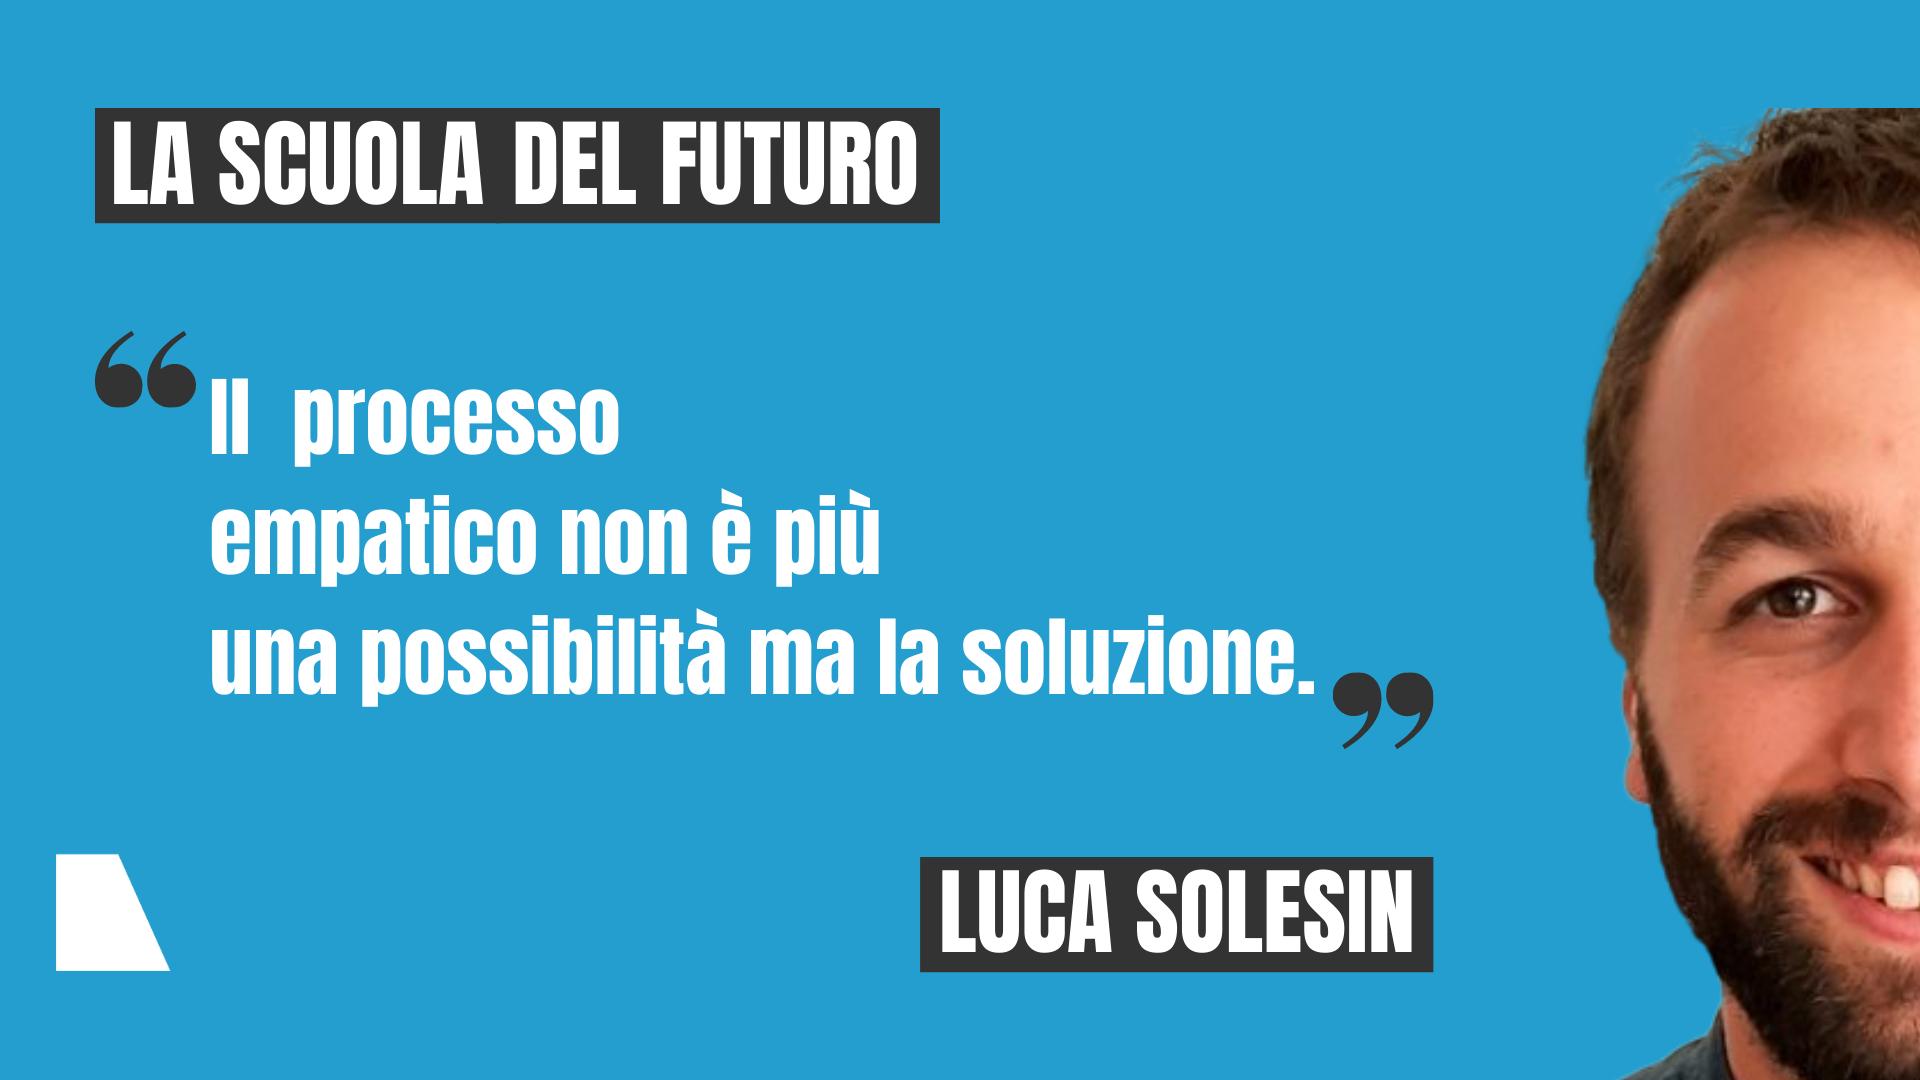 La scuola del futuro Luca Solesin Ashoka